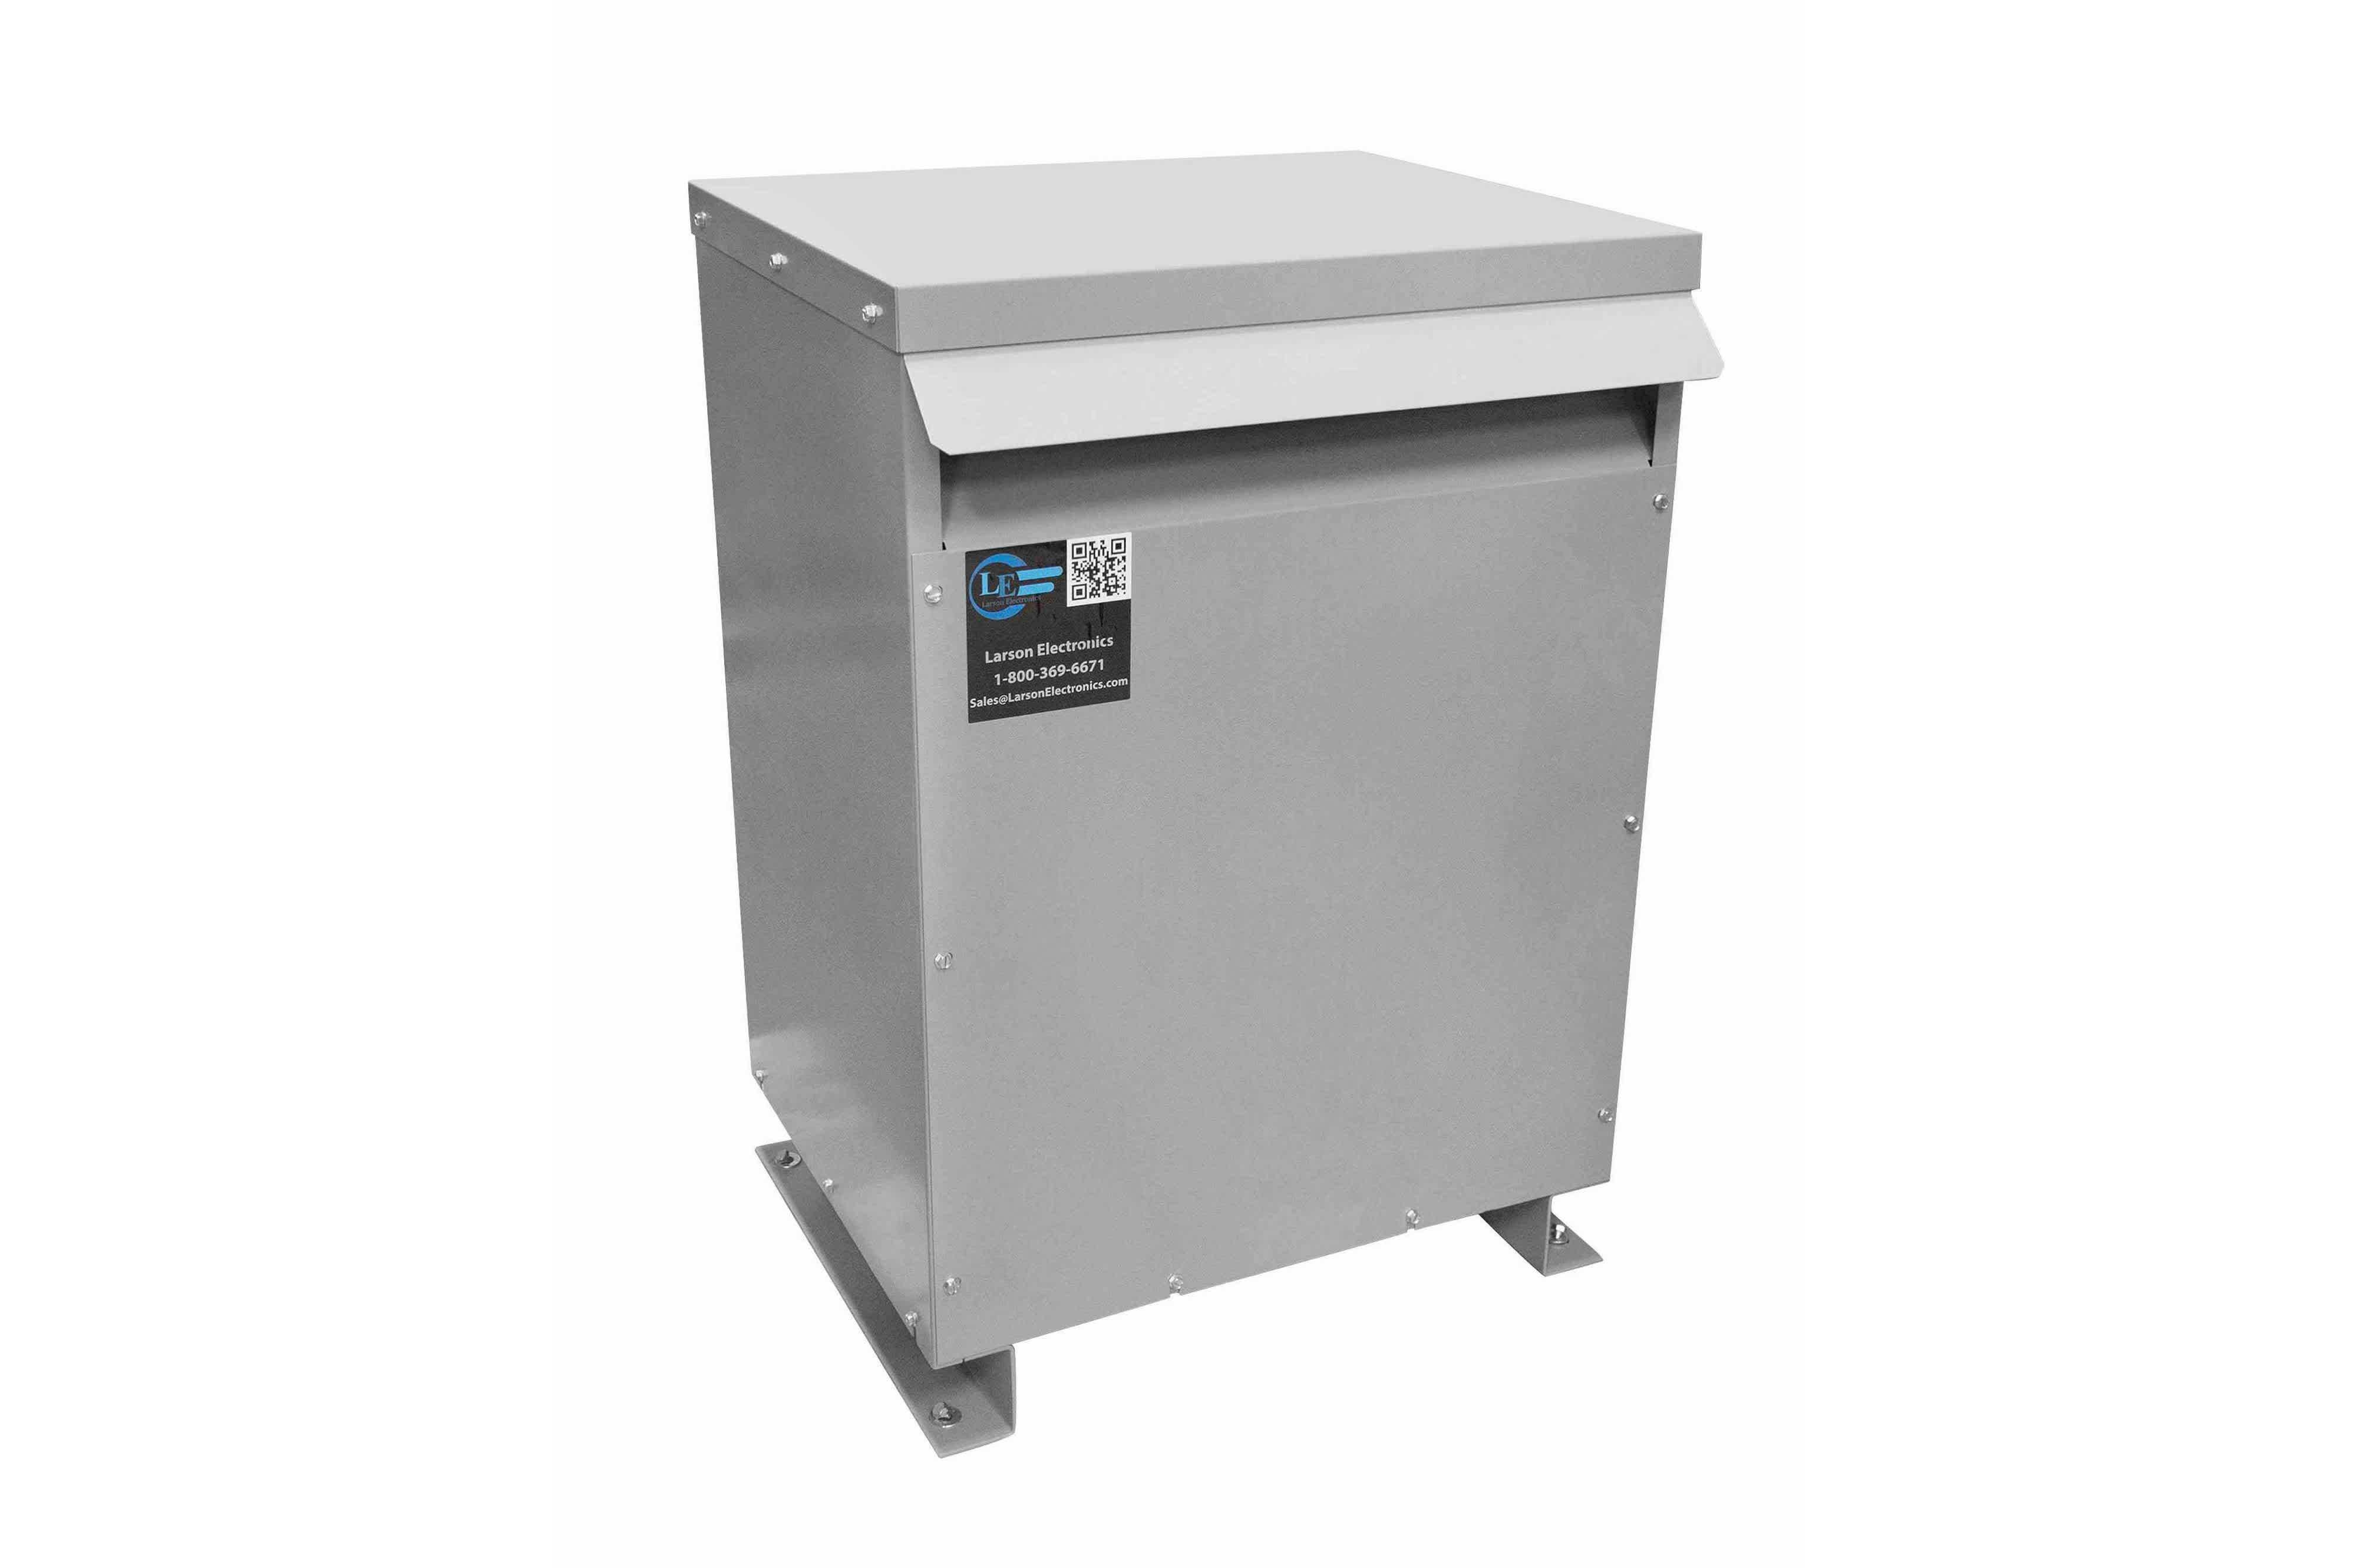 14 kVA 3PH Isolation Transformer, 575V Wye Primary, 480Y/277 Wye-N Secondary, N3R, Ventilated, 60 Hz